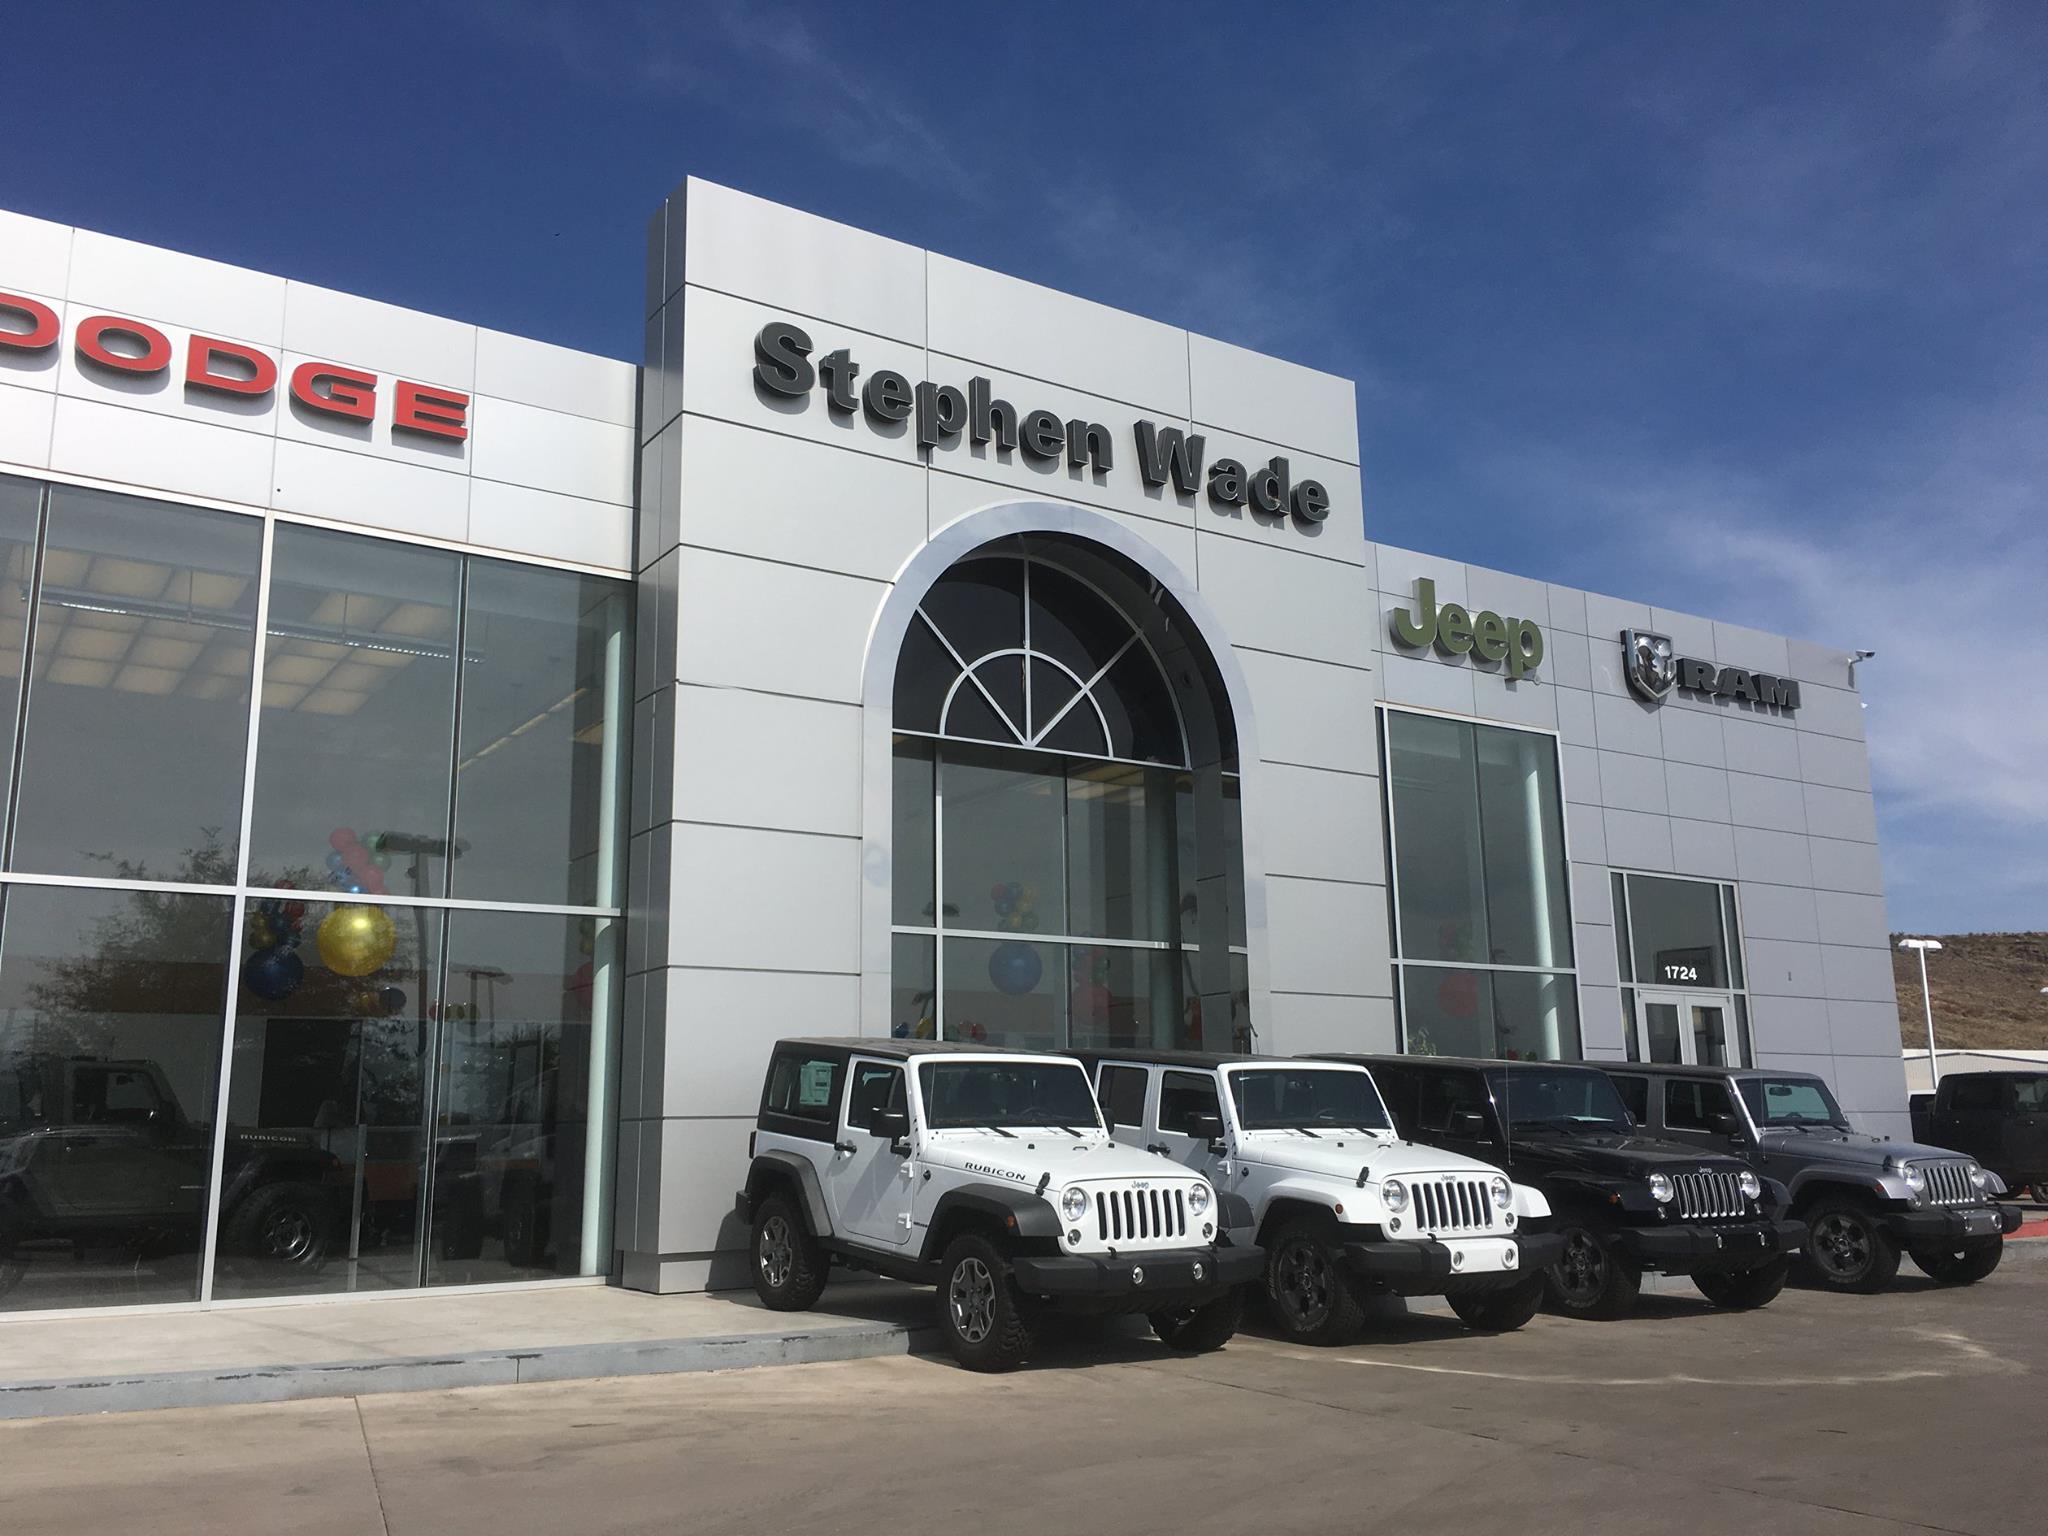 Stephen Wade Dodge >> Stephen Wade Chrysler Jeep Dodge Ram 1724 S Hilton Dr Saint